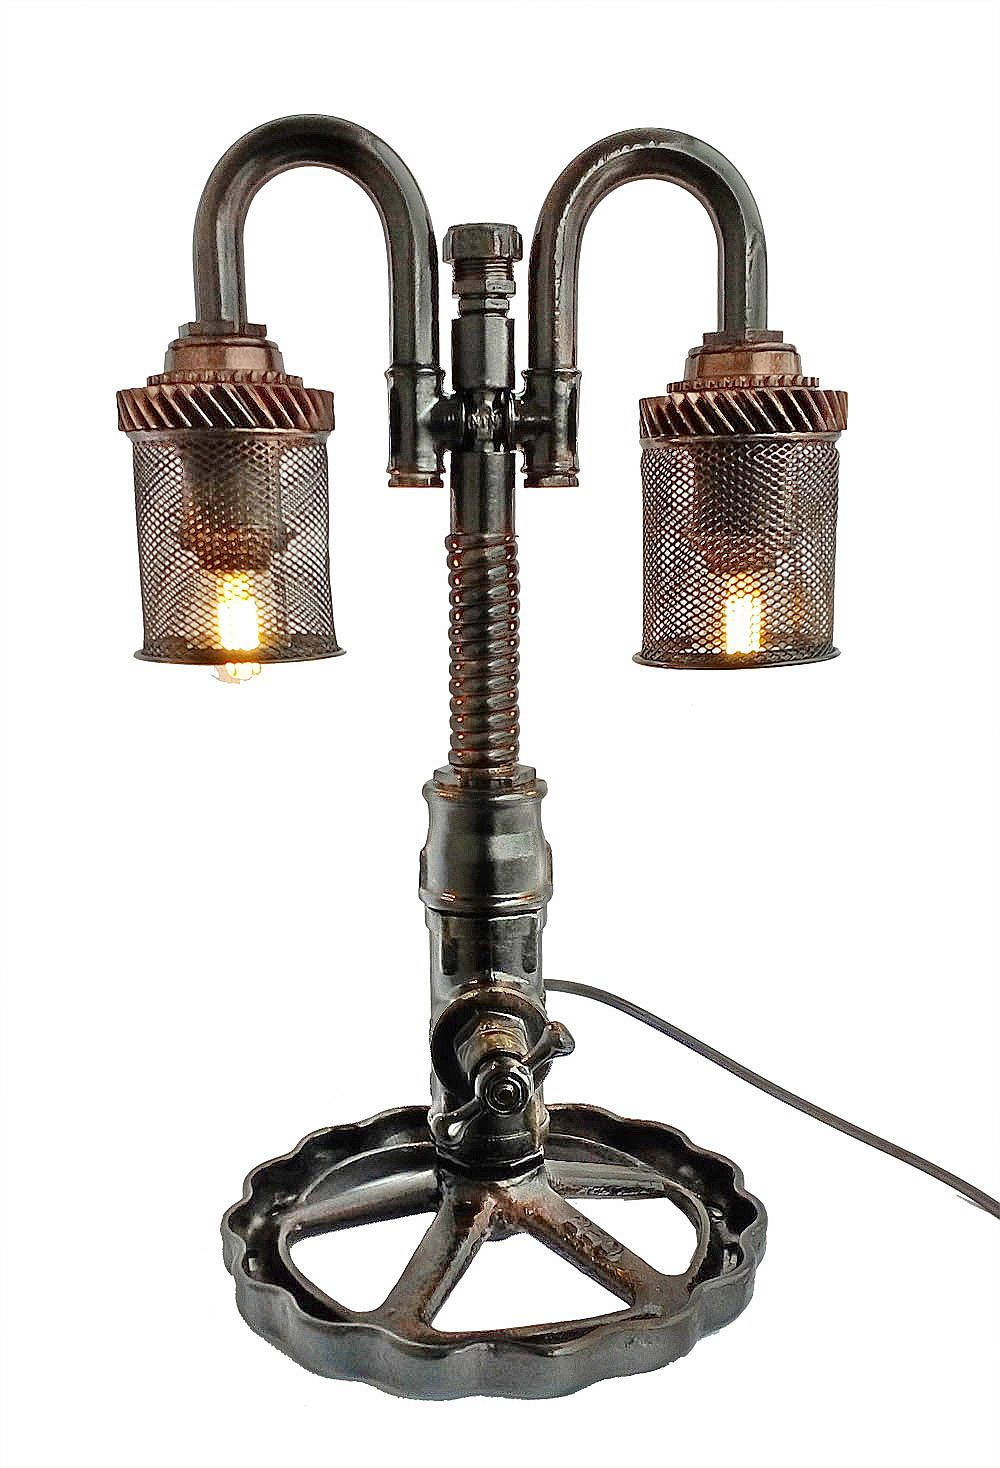 Industrial Steampunk Lighting Steampunk Industrial Lamp Retro Dining Room Lighting Vintage Industrial Outdoor Lighting R Steampunk Lighting Lamp Table Lamp